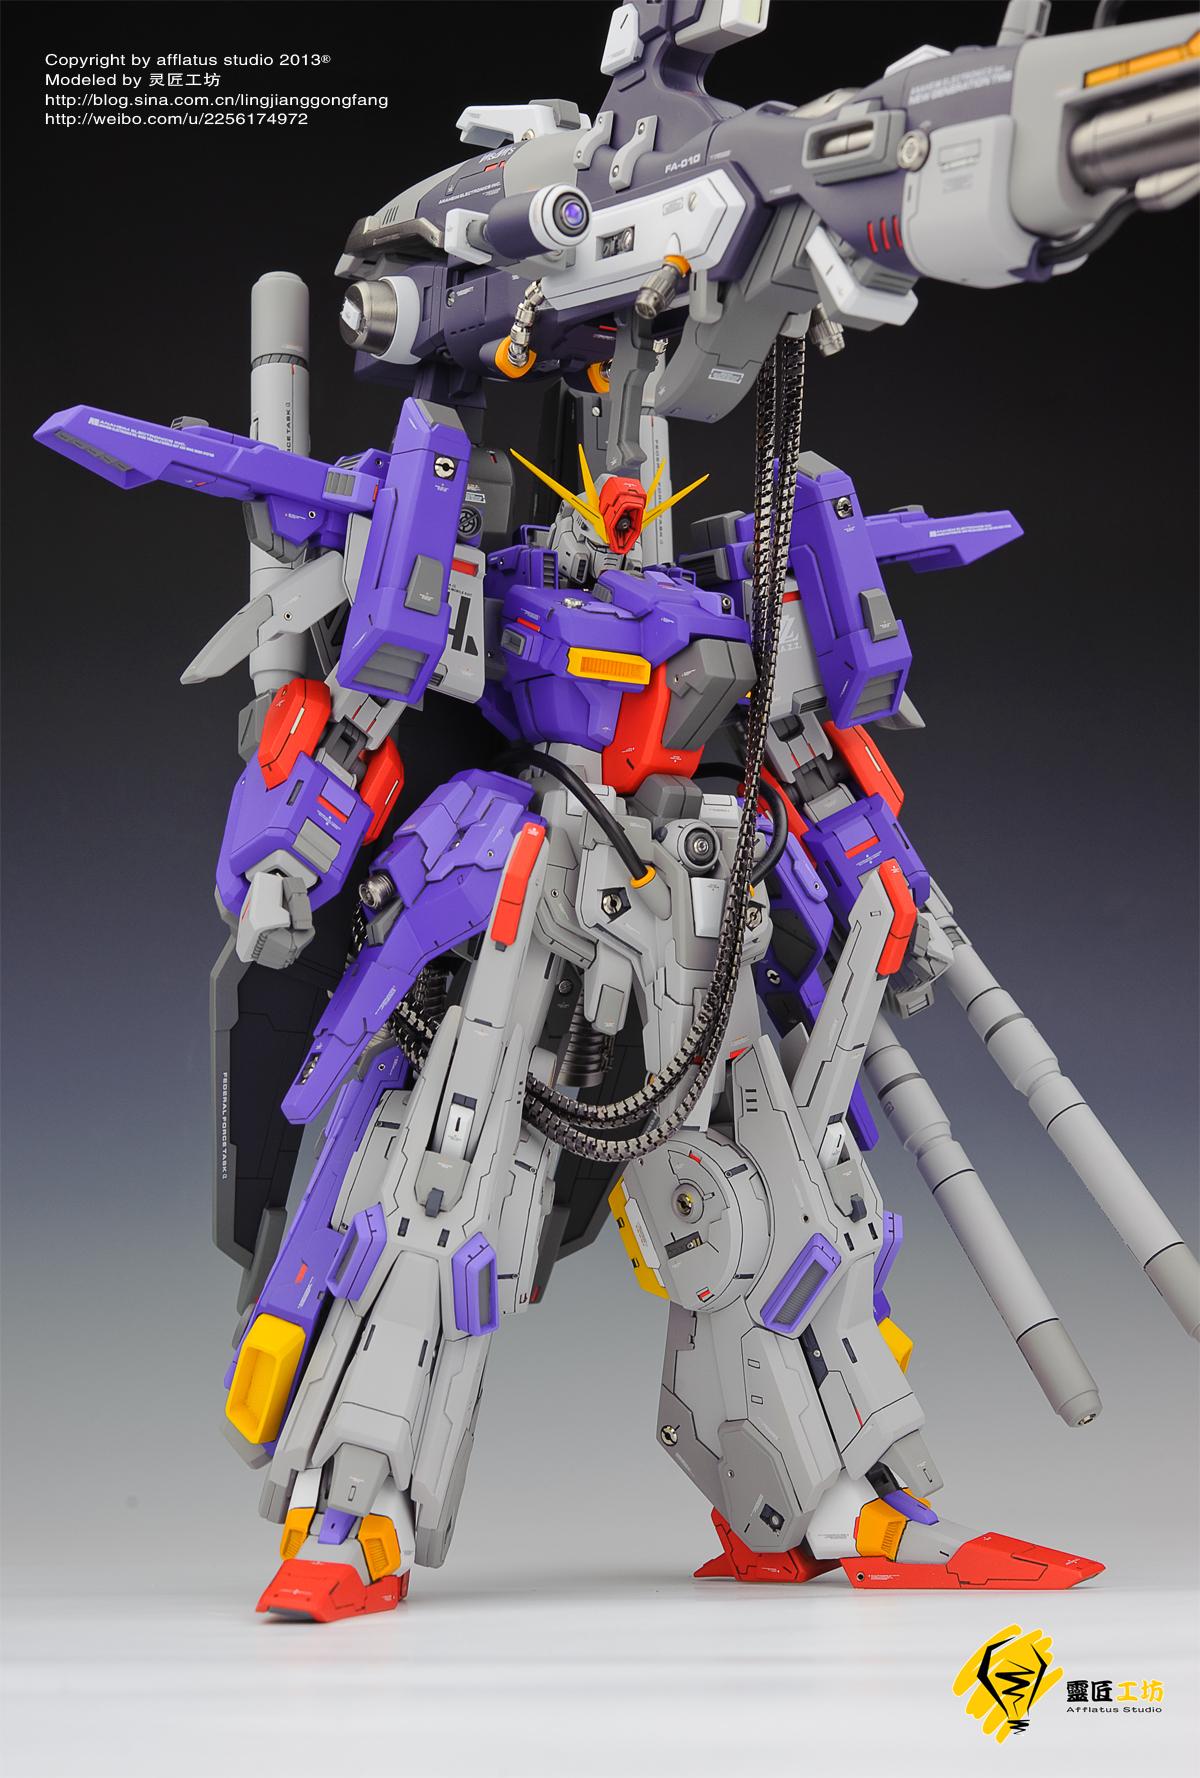 GUNJAPG-System 1/72 FA-ZZ Gundam FA-010 Full Armor: Modeled by Afflatus Studio. Full Photoreview No.22 Wallpaper Size Images, Info